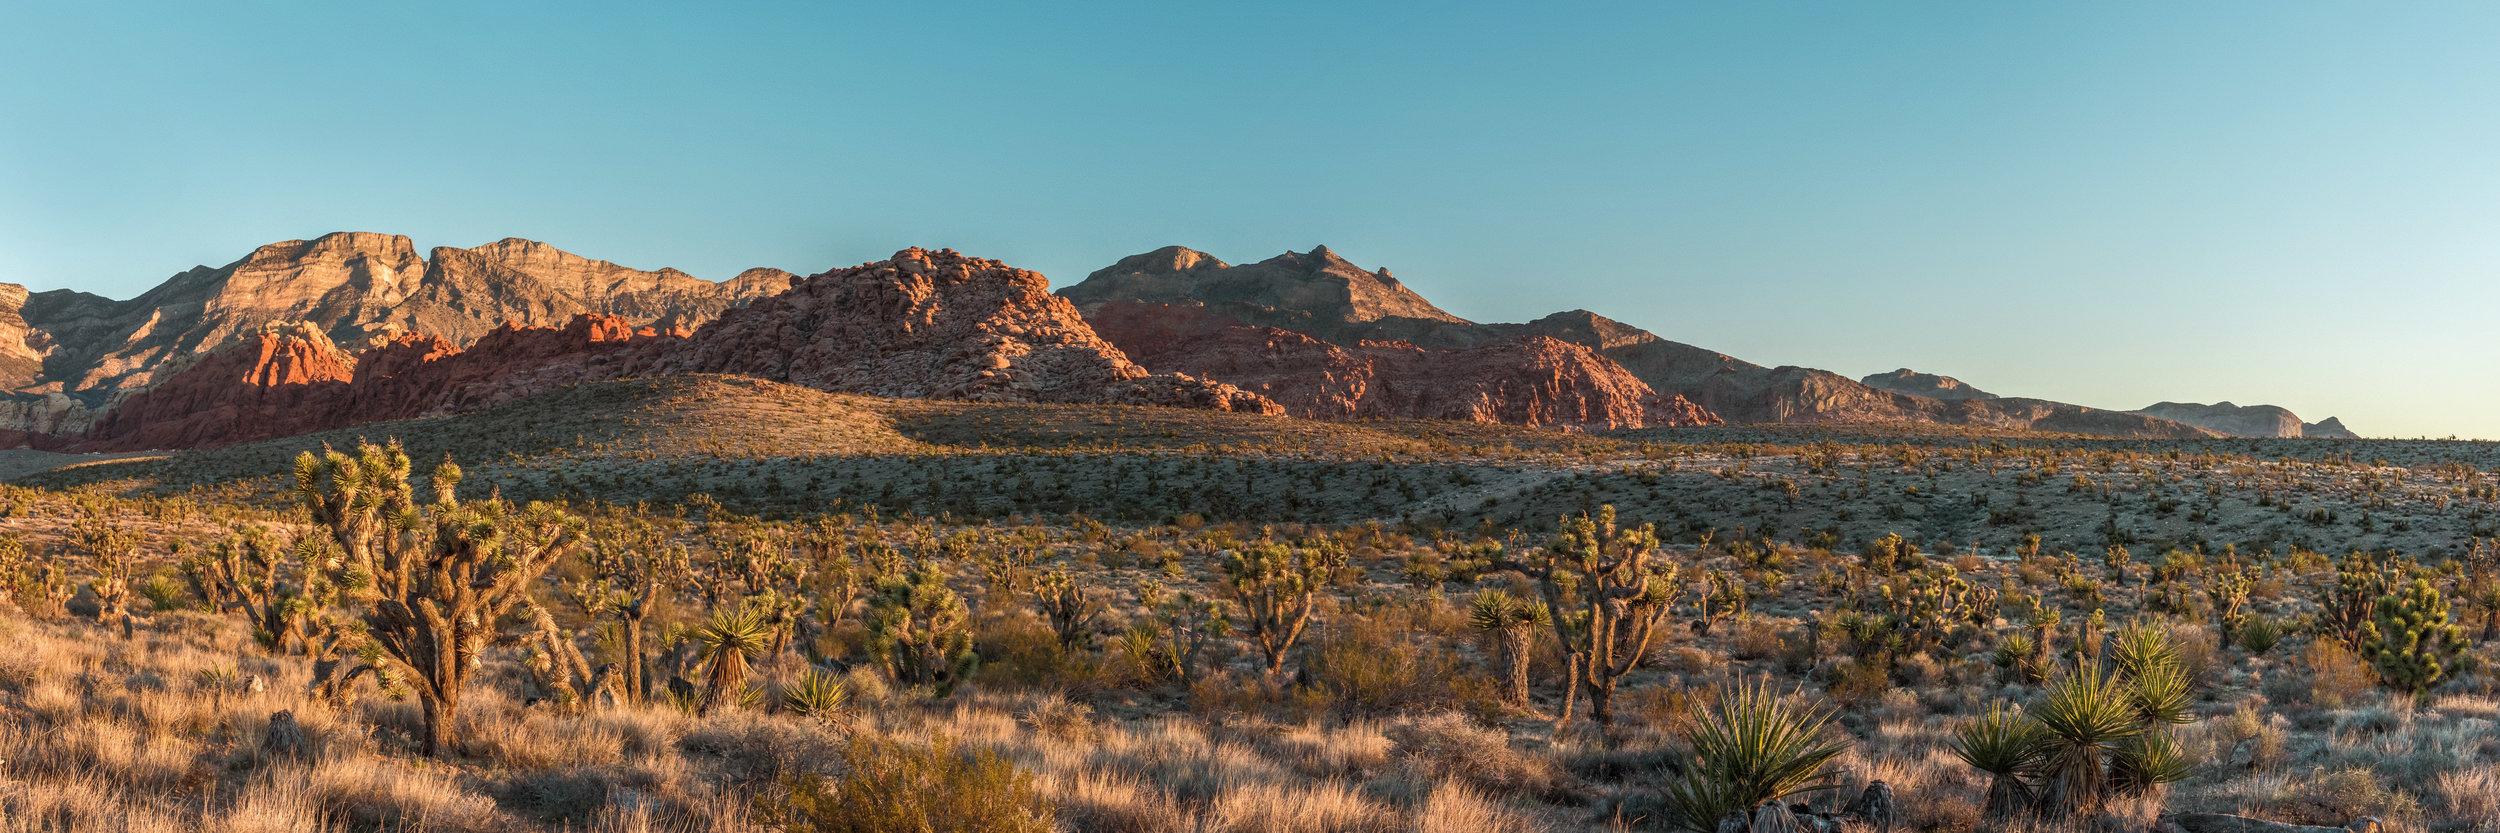 Red-Rock-Canyon-1-Edited-(web).jpg